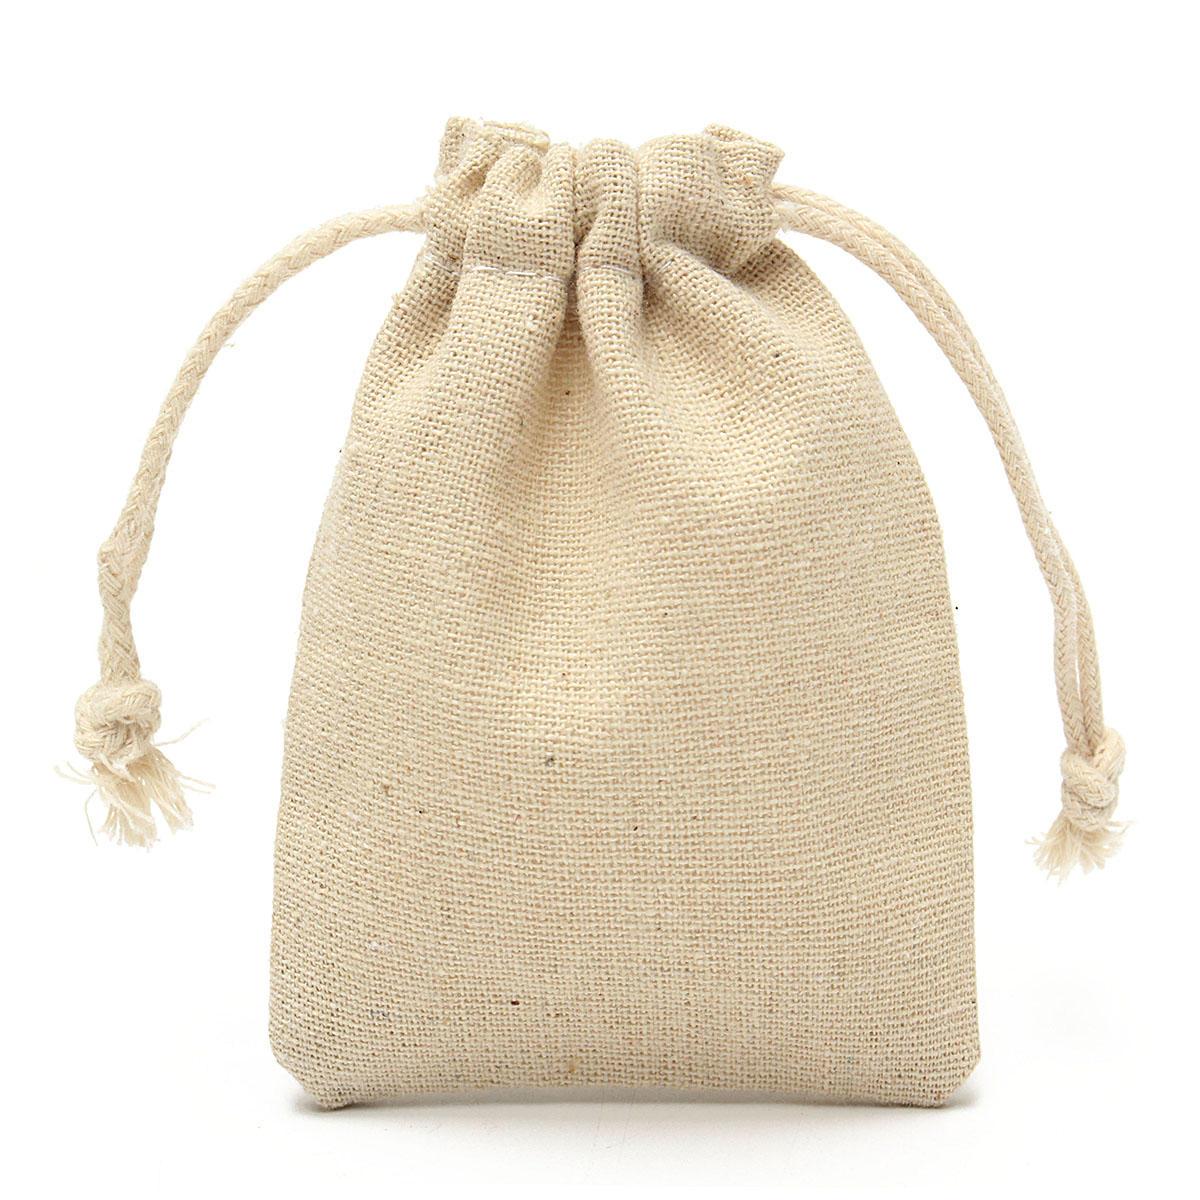 7fefddb7a 30Pcs Natural Linen Pouch Burlap Jute Sack Jewelry Pouch Drawstring Gift  Bags 8x10cm COD